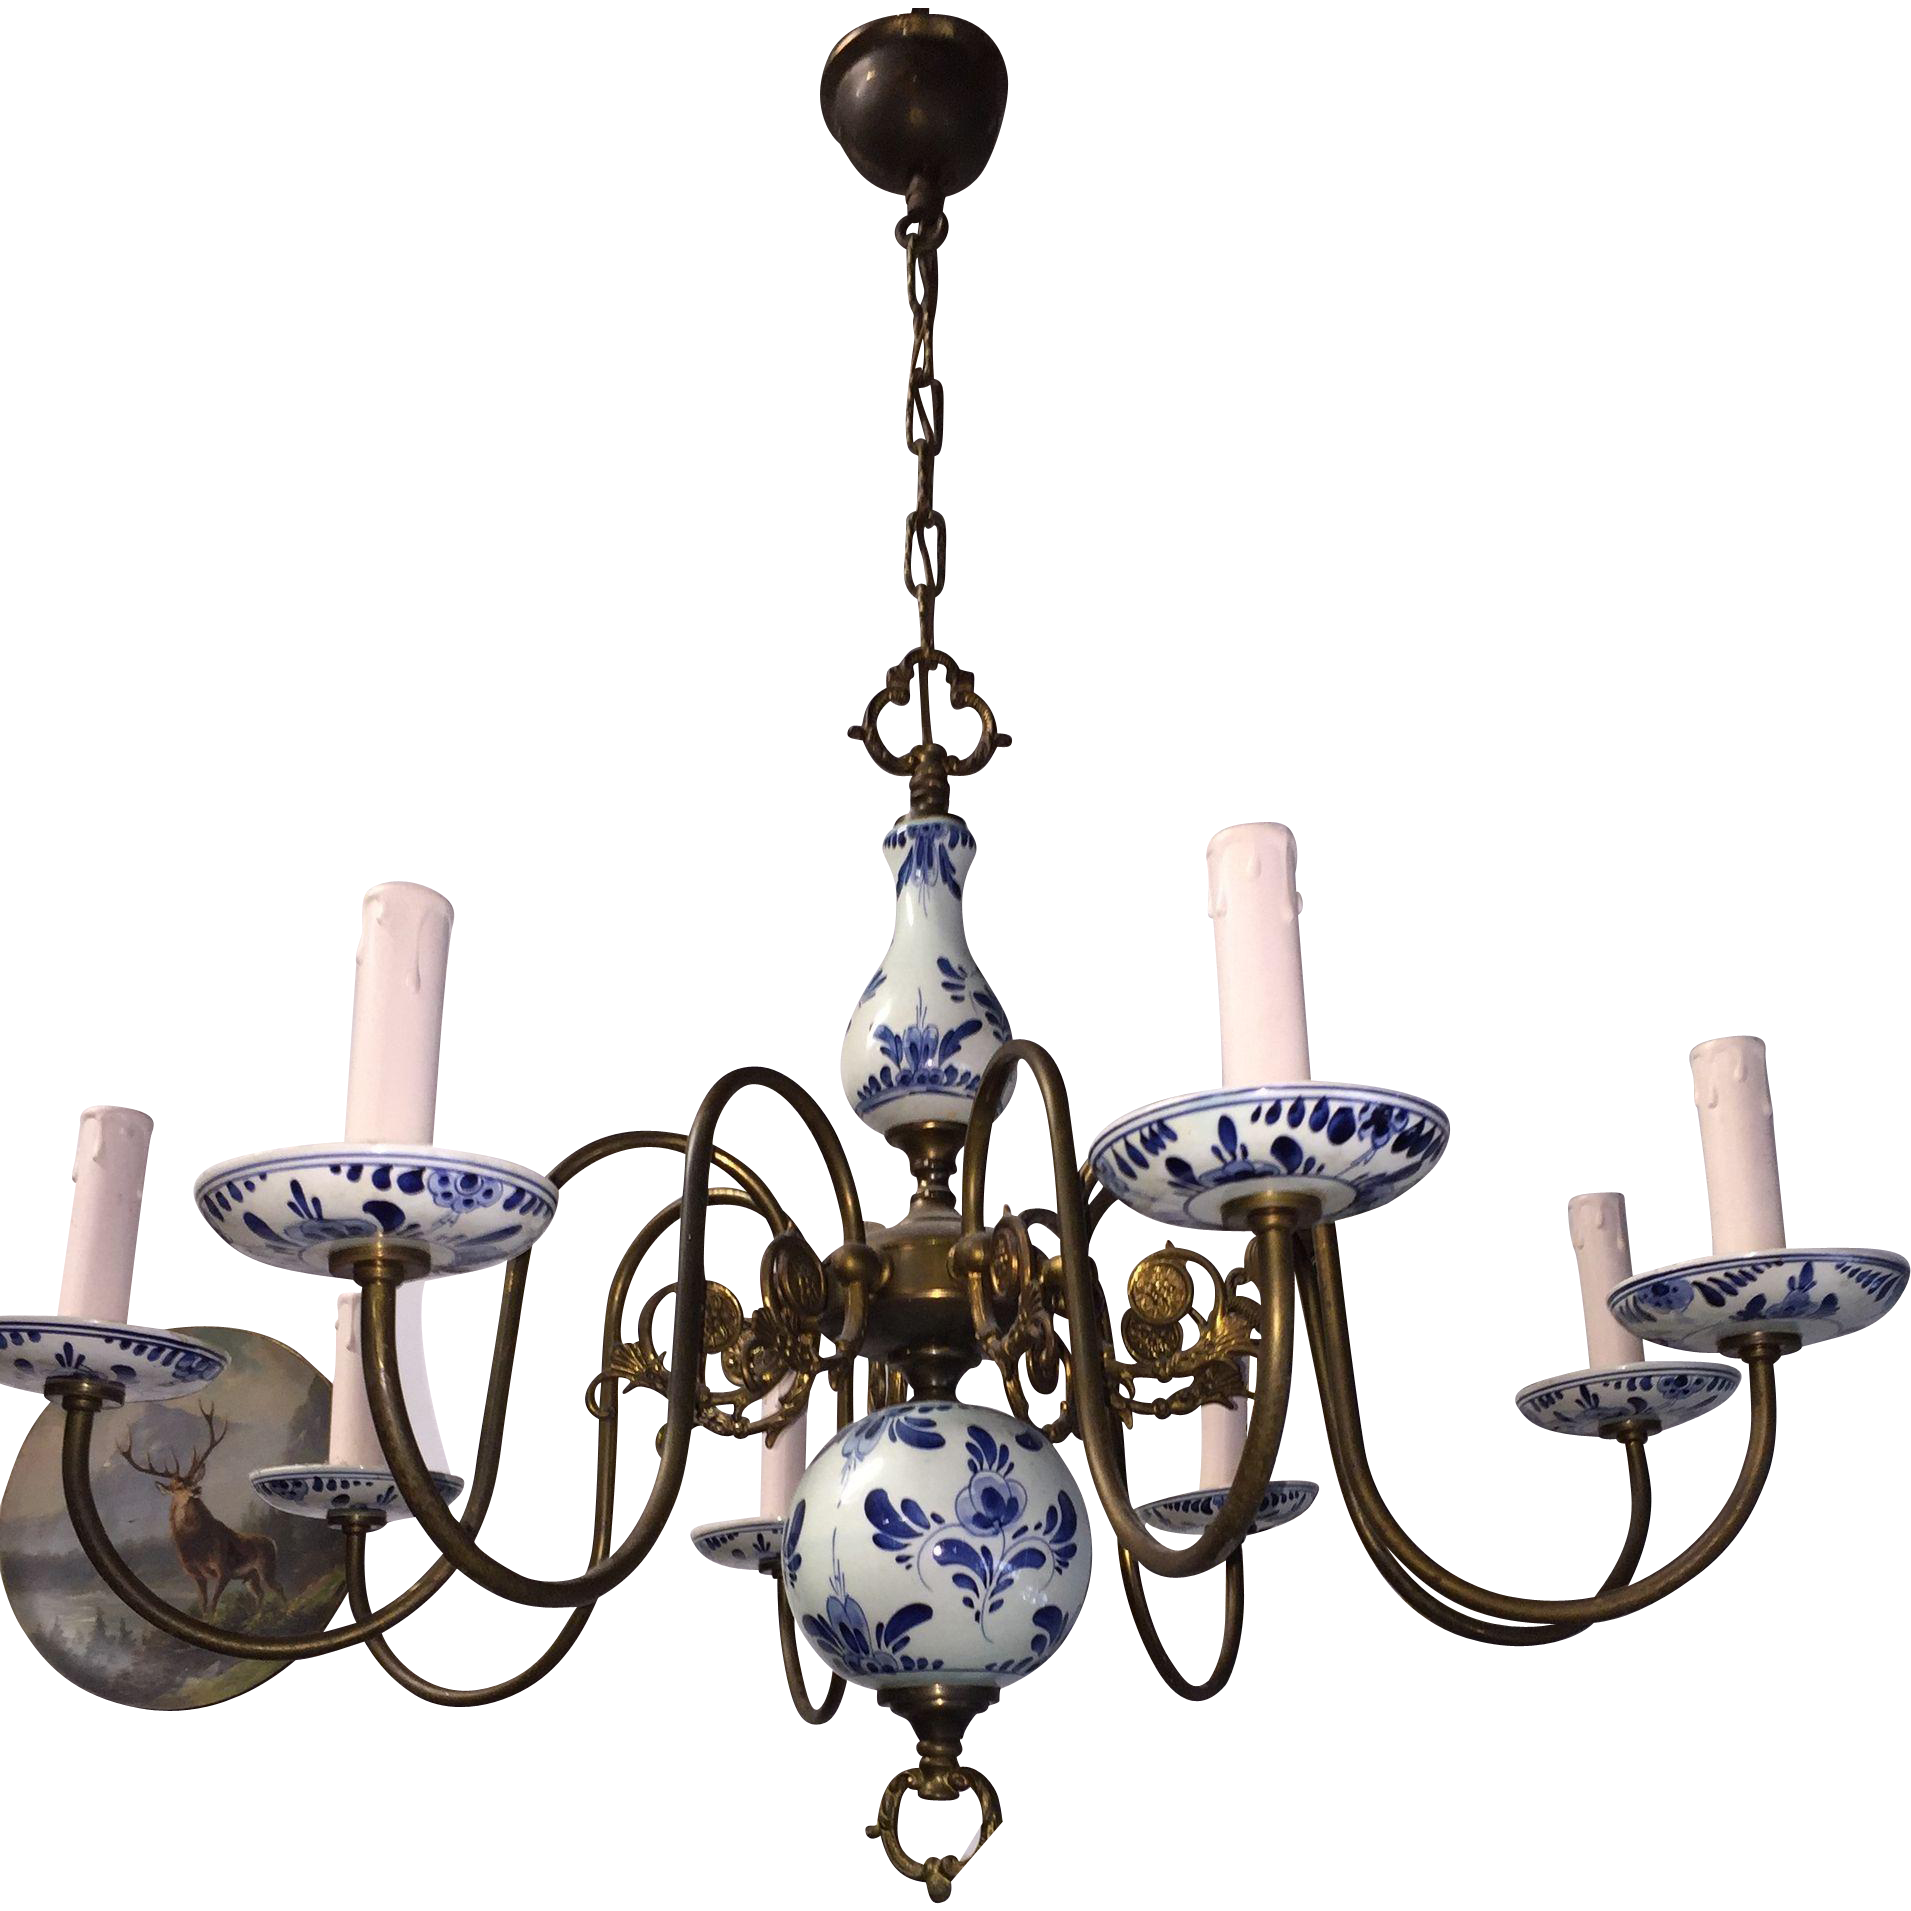 Sold to els vintage brass porcelain delft blue chandelier sold to els vintage brass porcelain delft blue chandelier europe antiques collectibles and decorations shop ruby lane mozeypictures Gallery